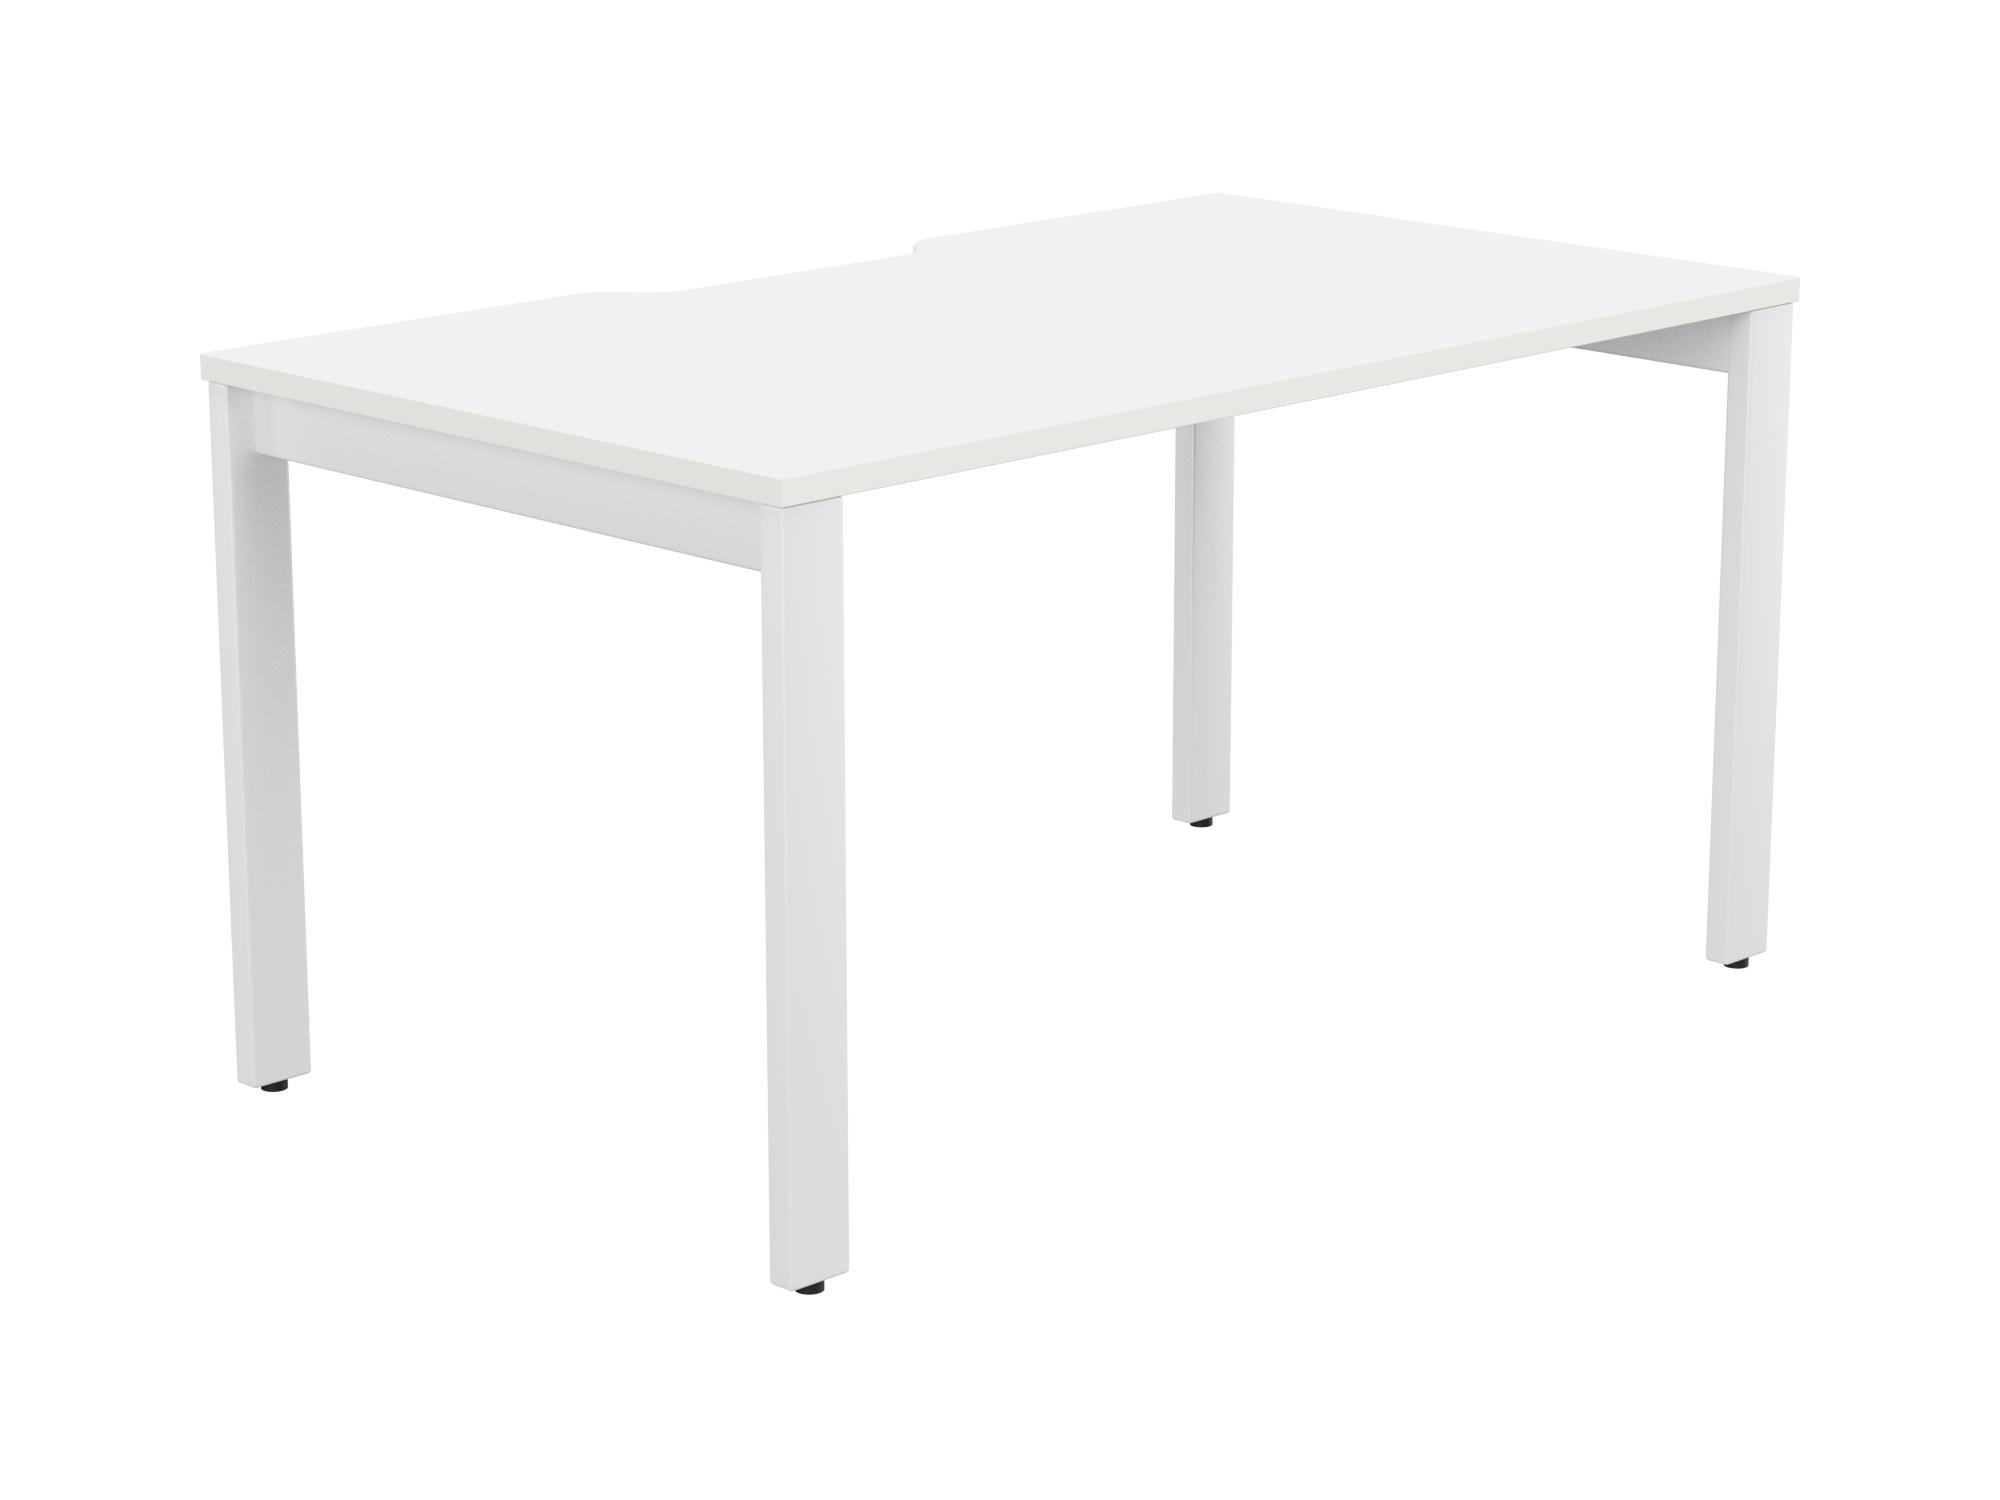 Switch 1 Person Bench Open Leg Scallop Top 1600 x 800 - White Frame / White Top